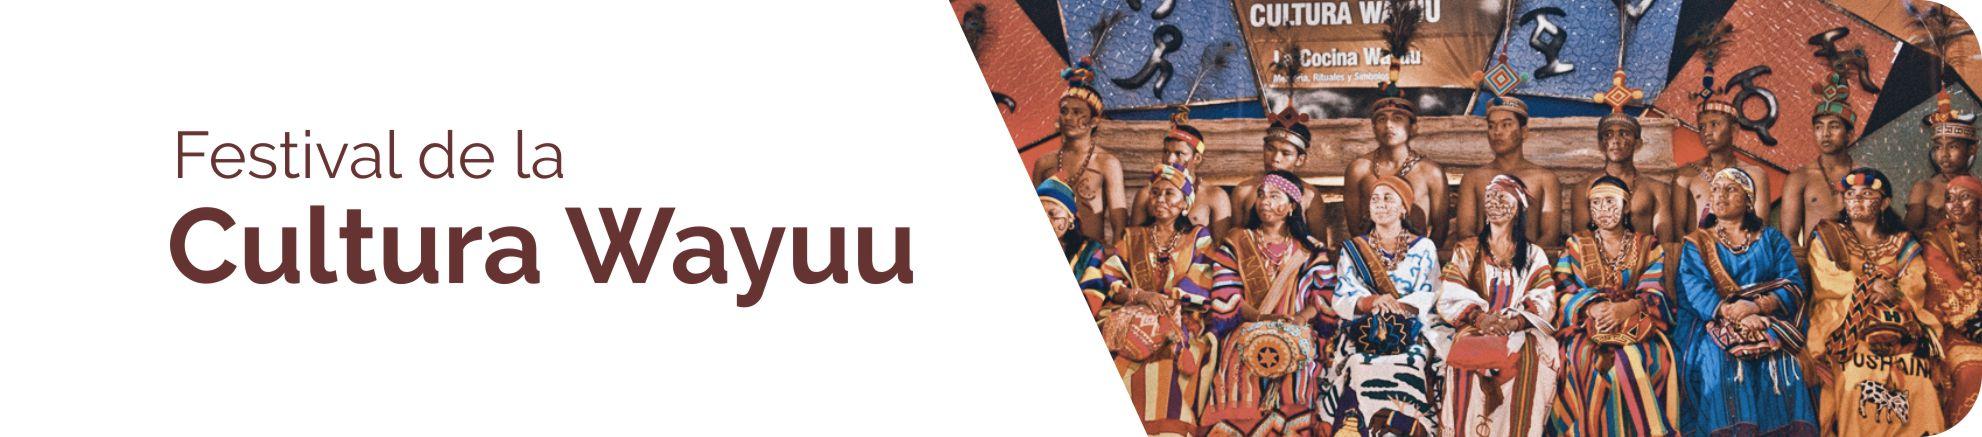 cultura-wayuu-expotur-guajira-riohacha-colombia